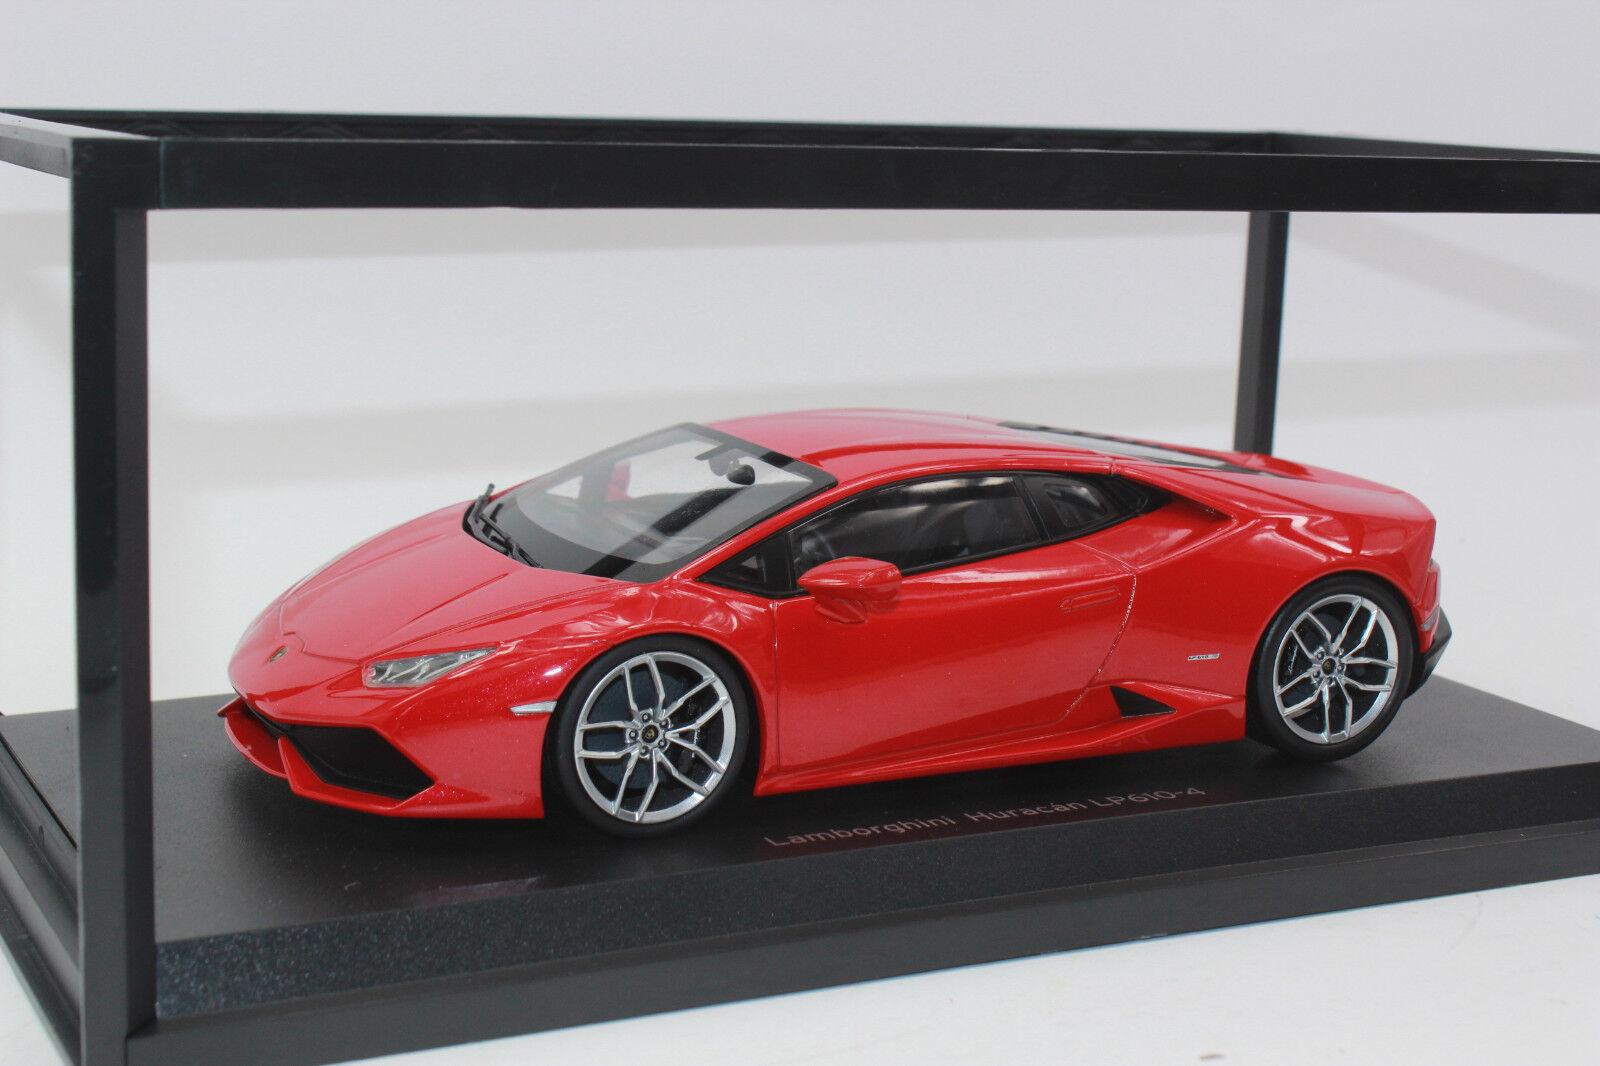 Kyosho 9511 RM Lamborghini Huracán 610-4 rojo 1   18 nueva en caja original